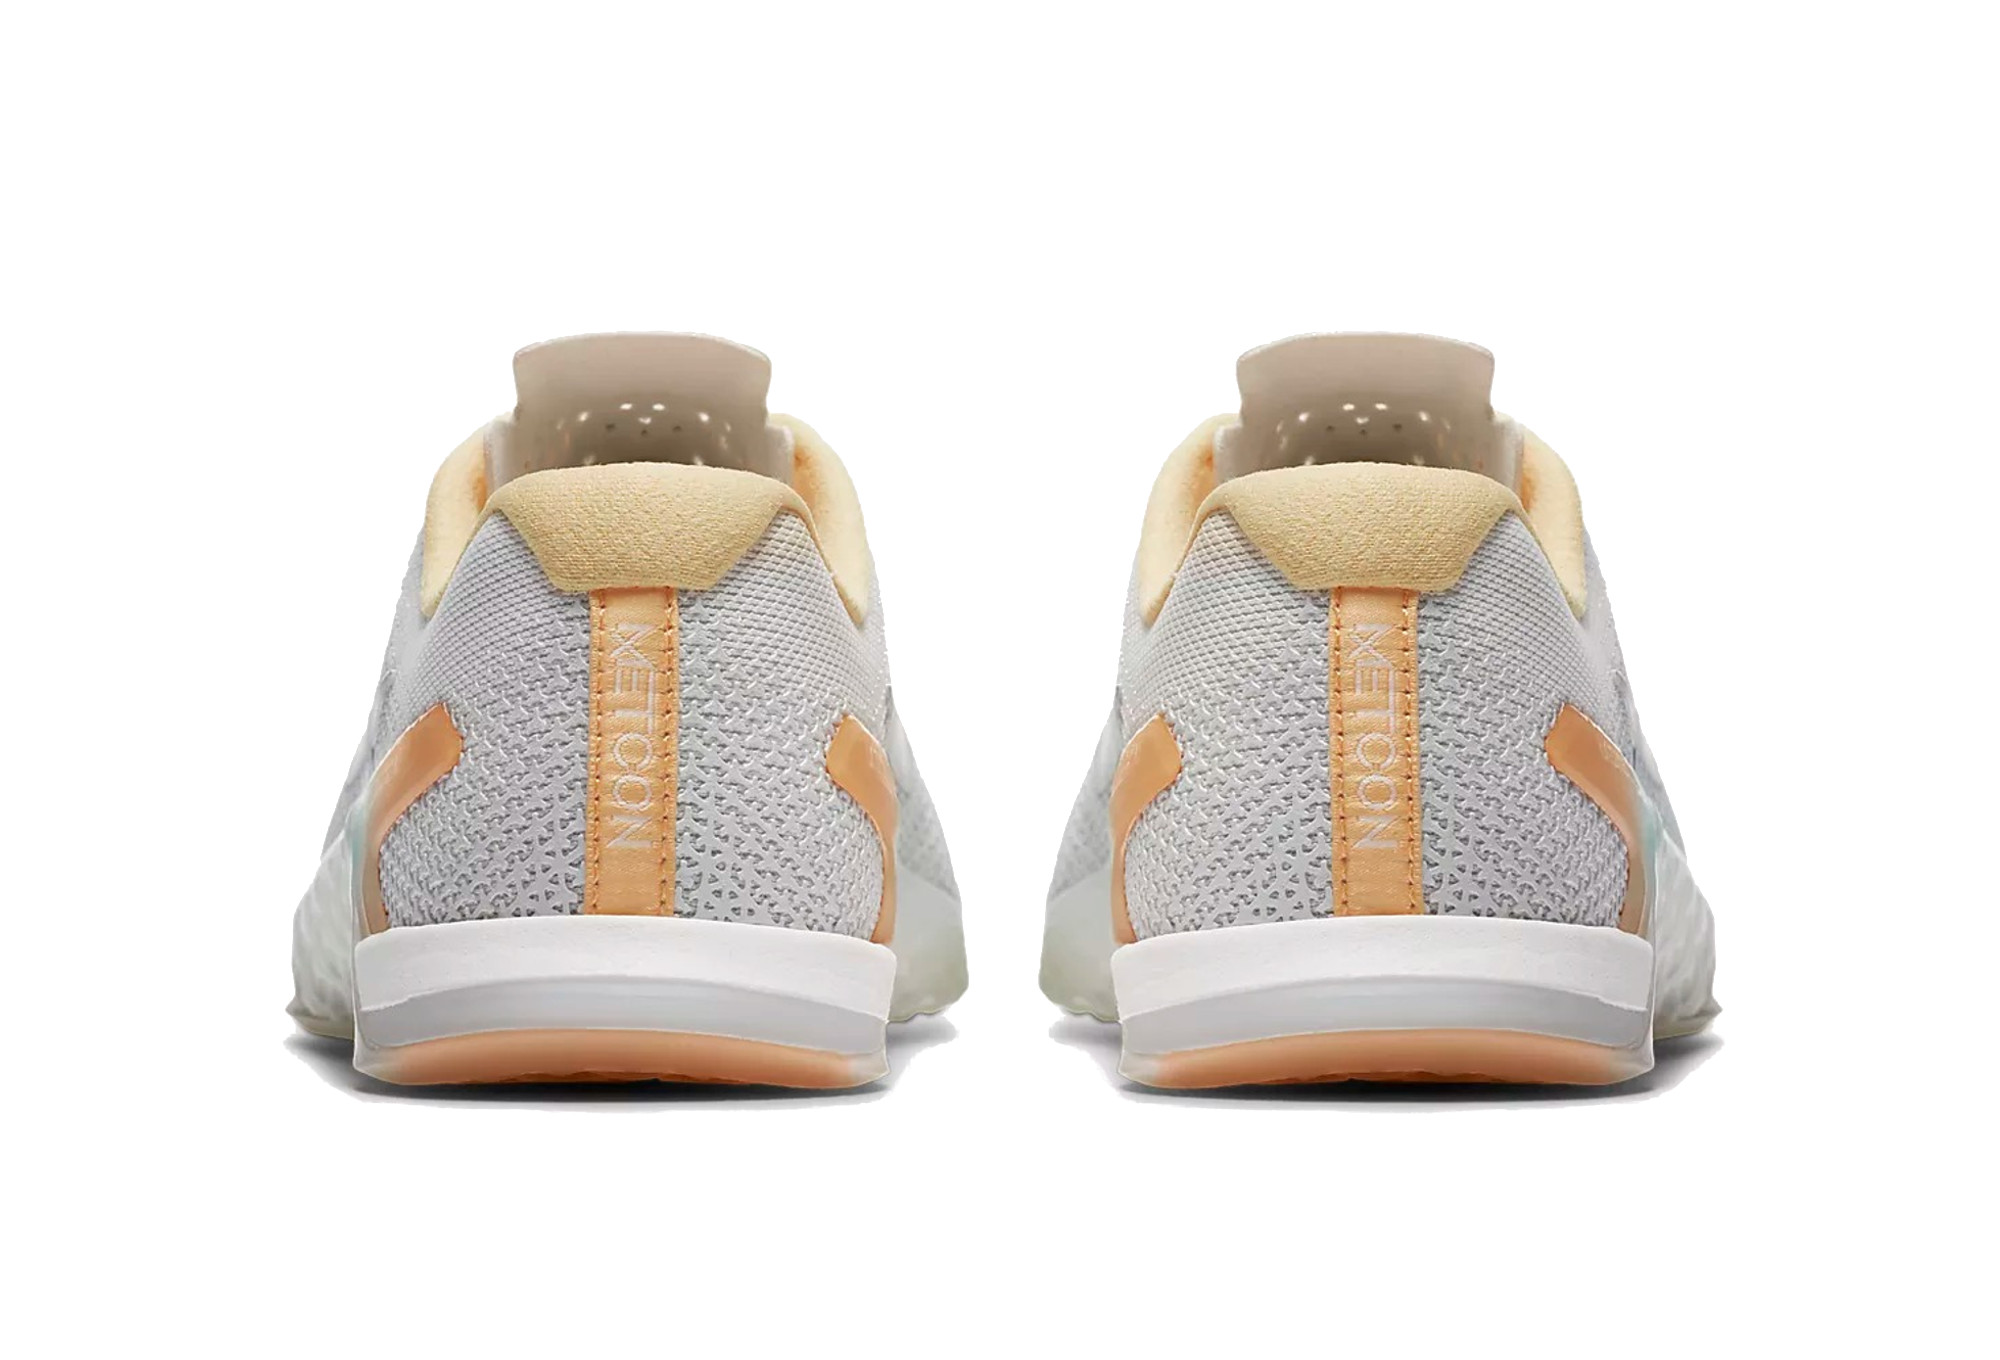 Chaussures De Rise Cross Metcon Training 4 Femme Nike z1Bqzr6w